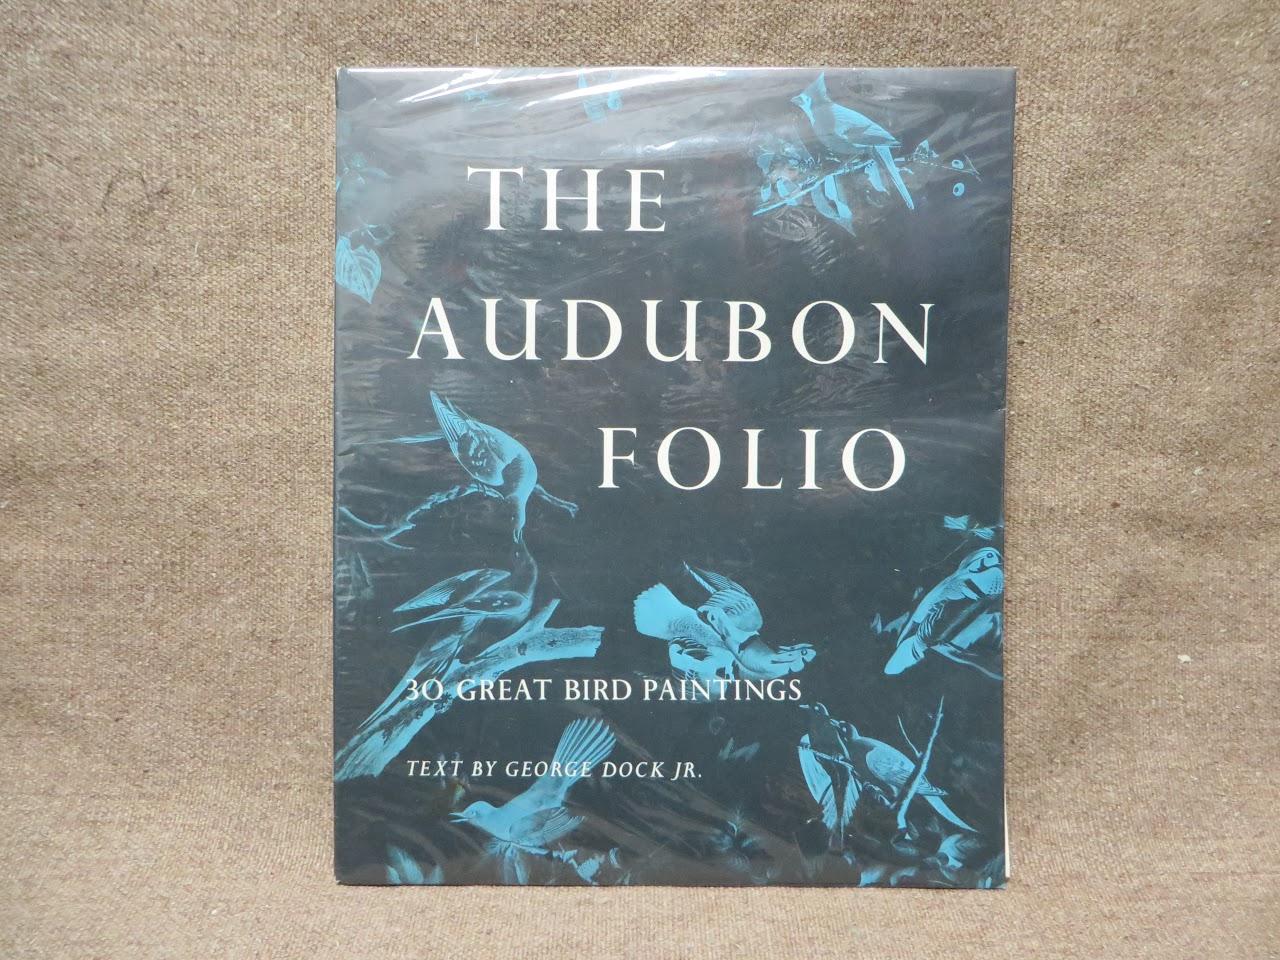 The Audubon Folio of Prints